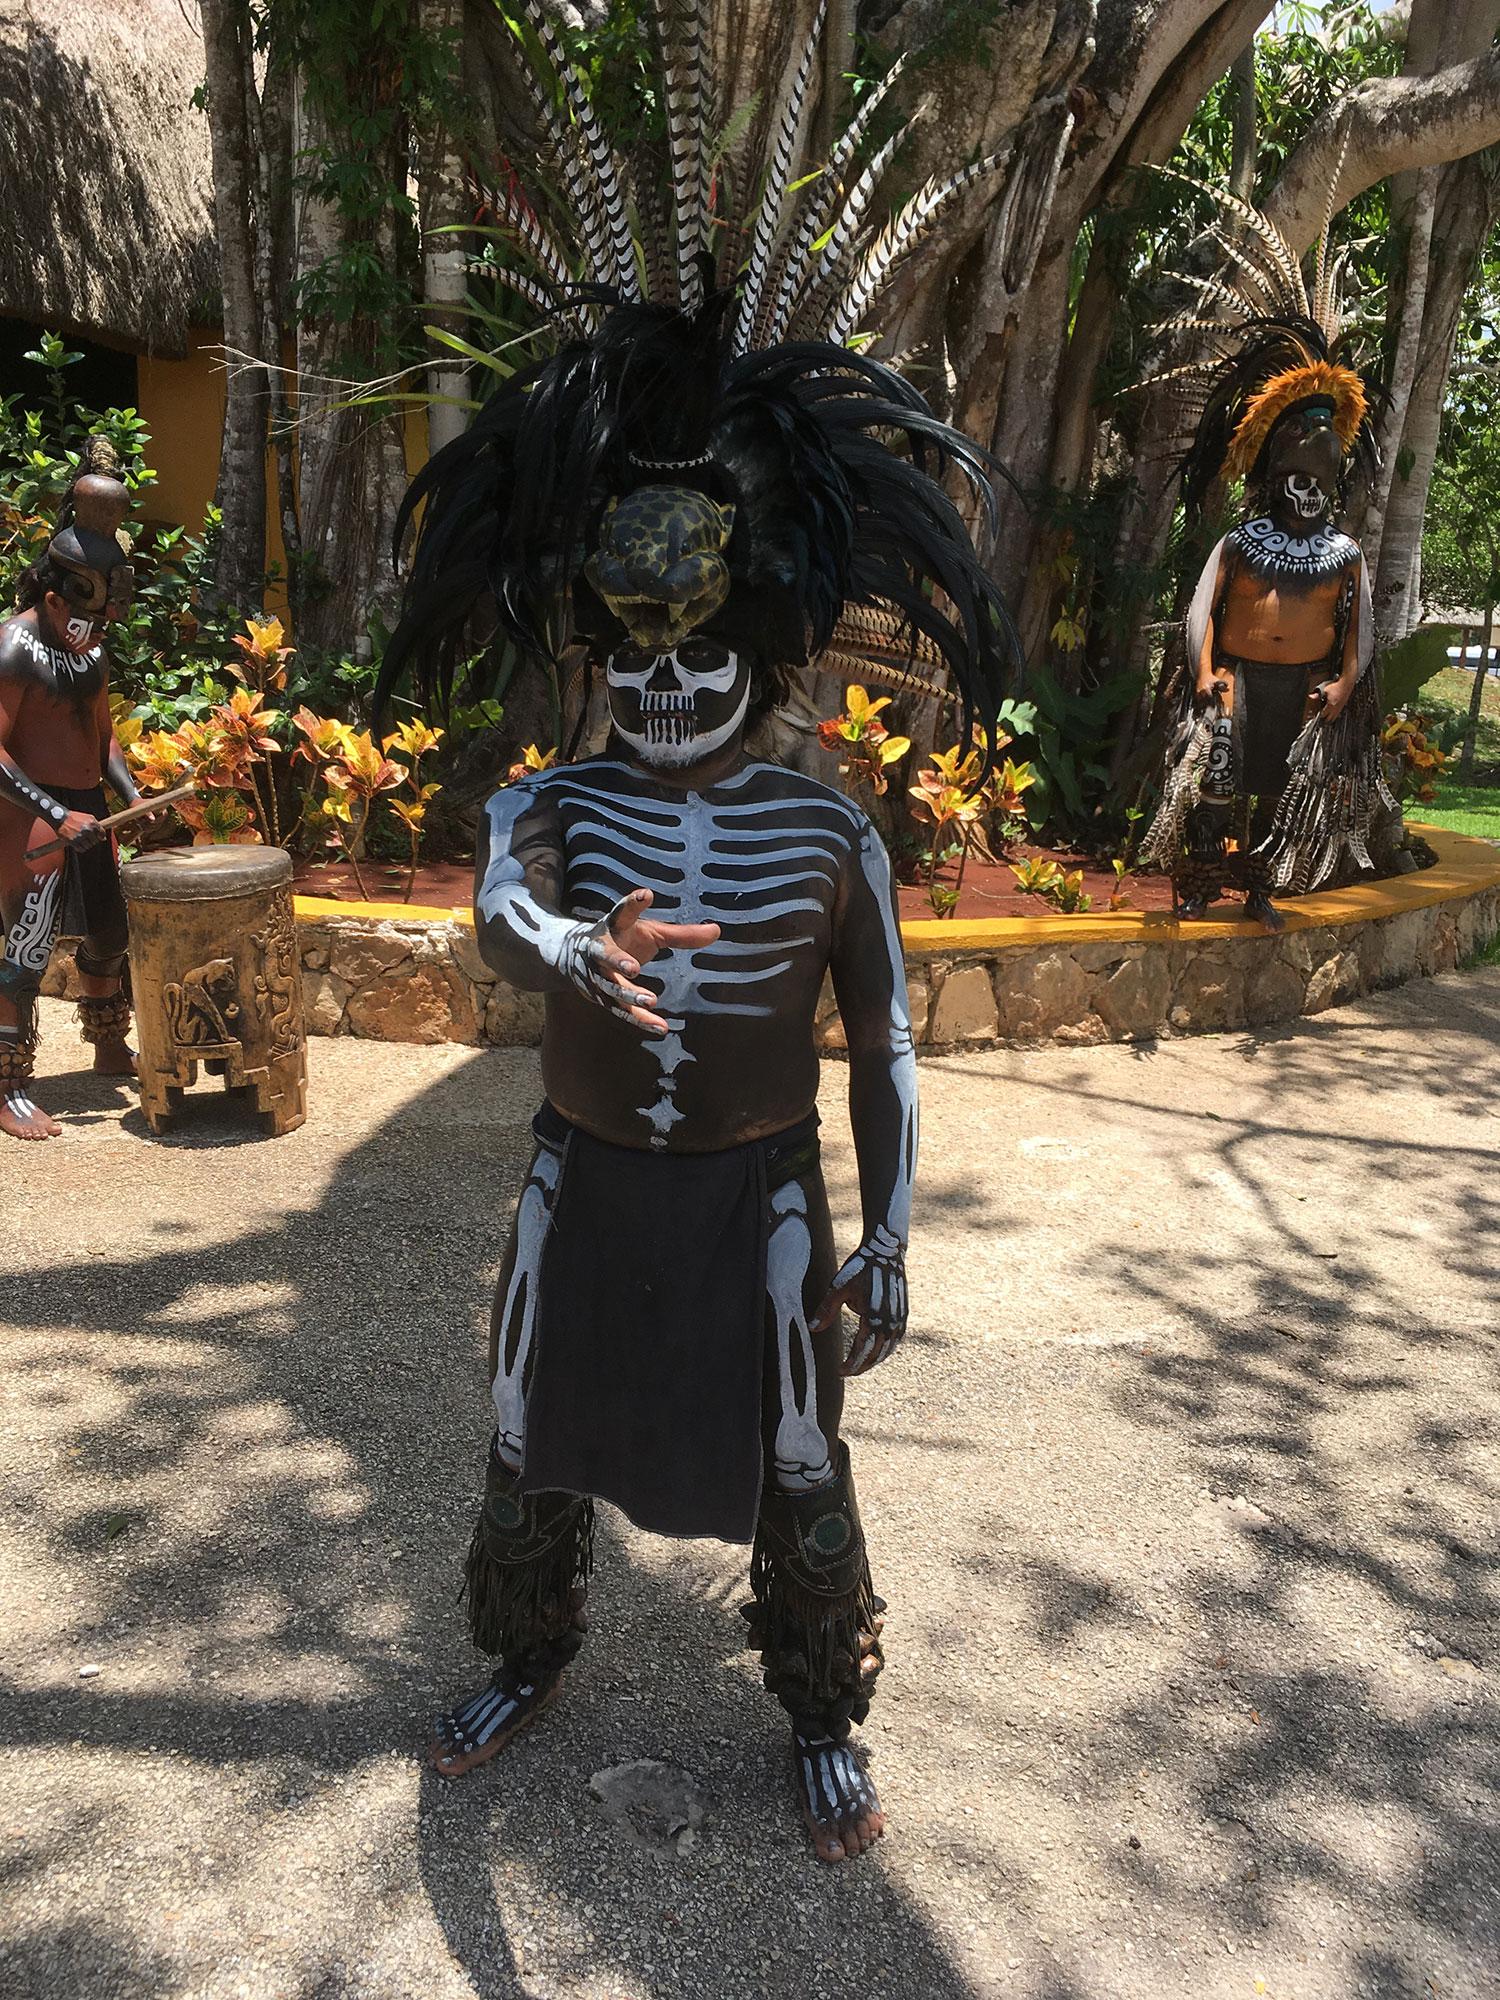 Hammocks_and_Ruins_What_to_Do_Mexico_Mayan_pyramid_cenote_Ik_Kil_15.jpg